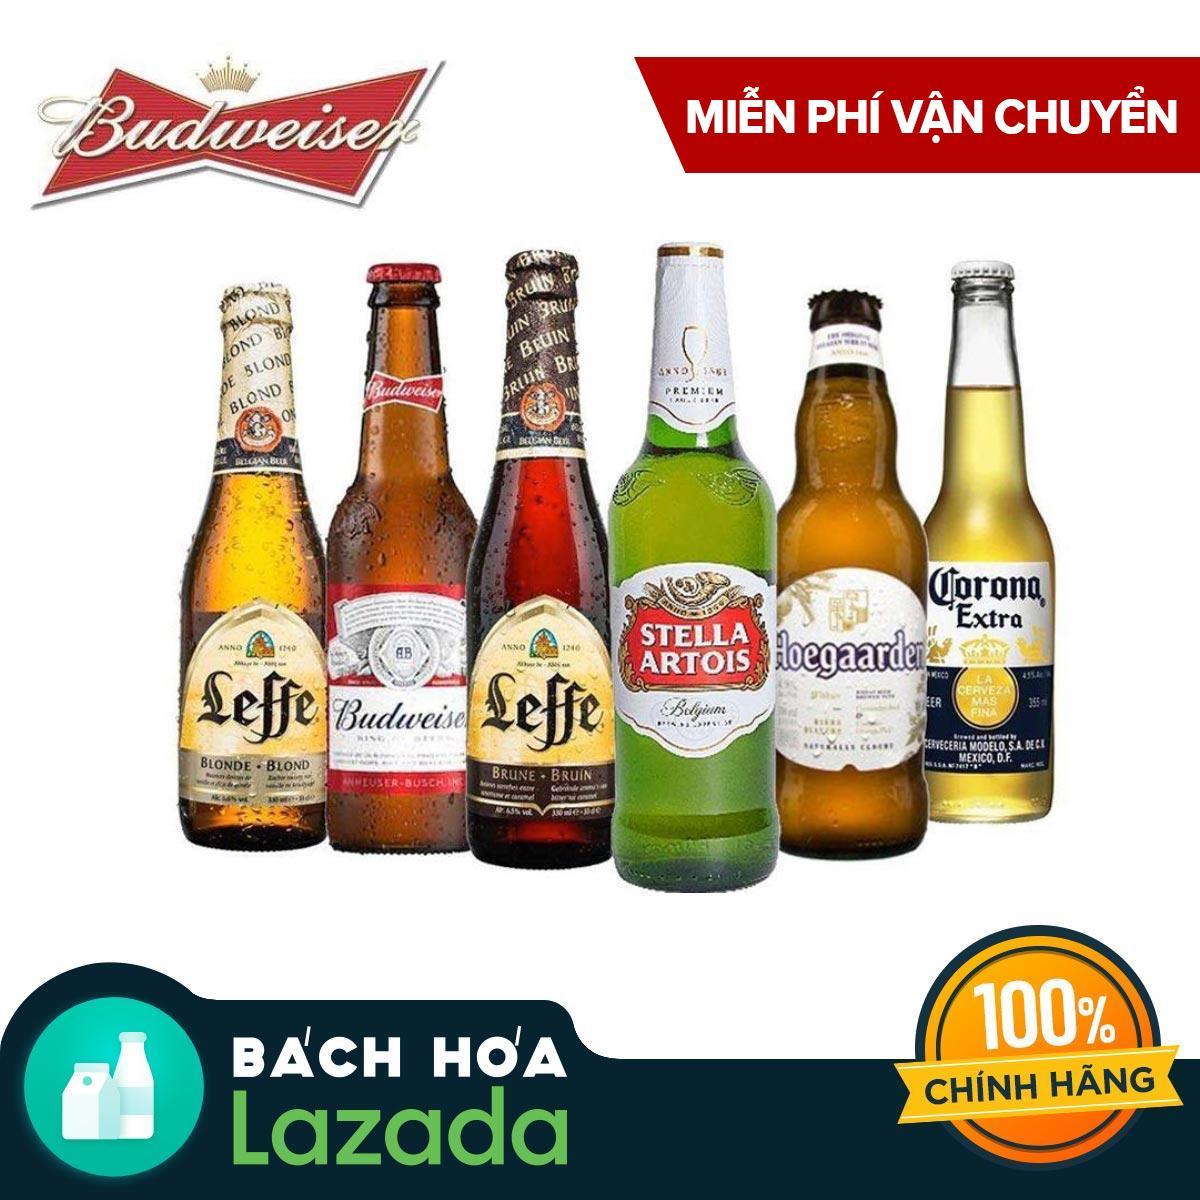 Bộ sưu tập bia cao cấp Beers of the World 6 chai - Budweiser, Leffe Blonde, Leffe Brune, Hoegaarden White, Stella Artois & Corona Extra Nhật Bản